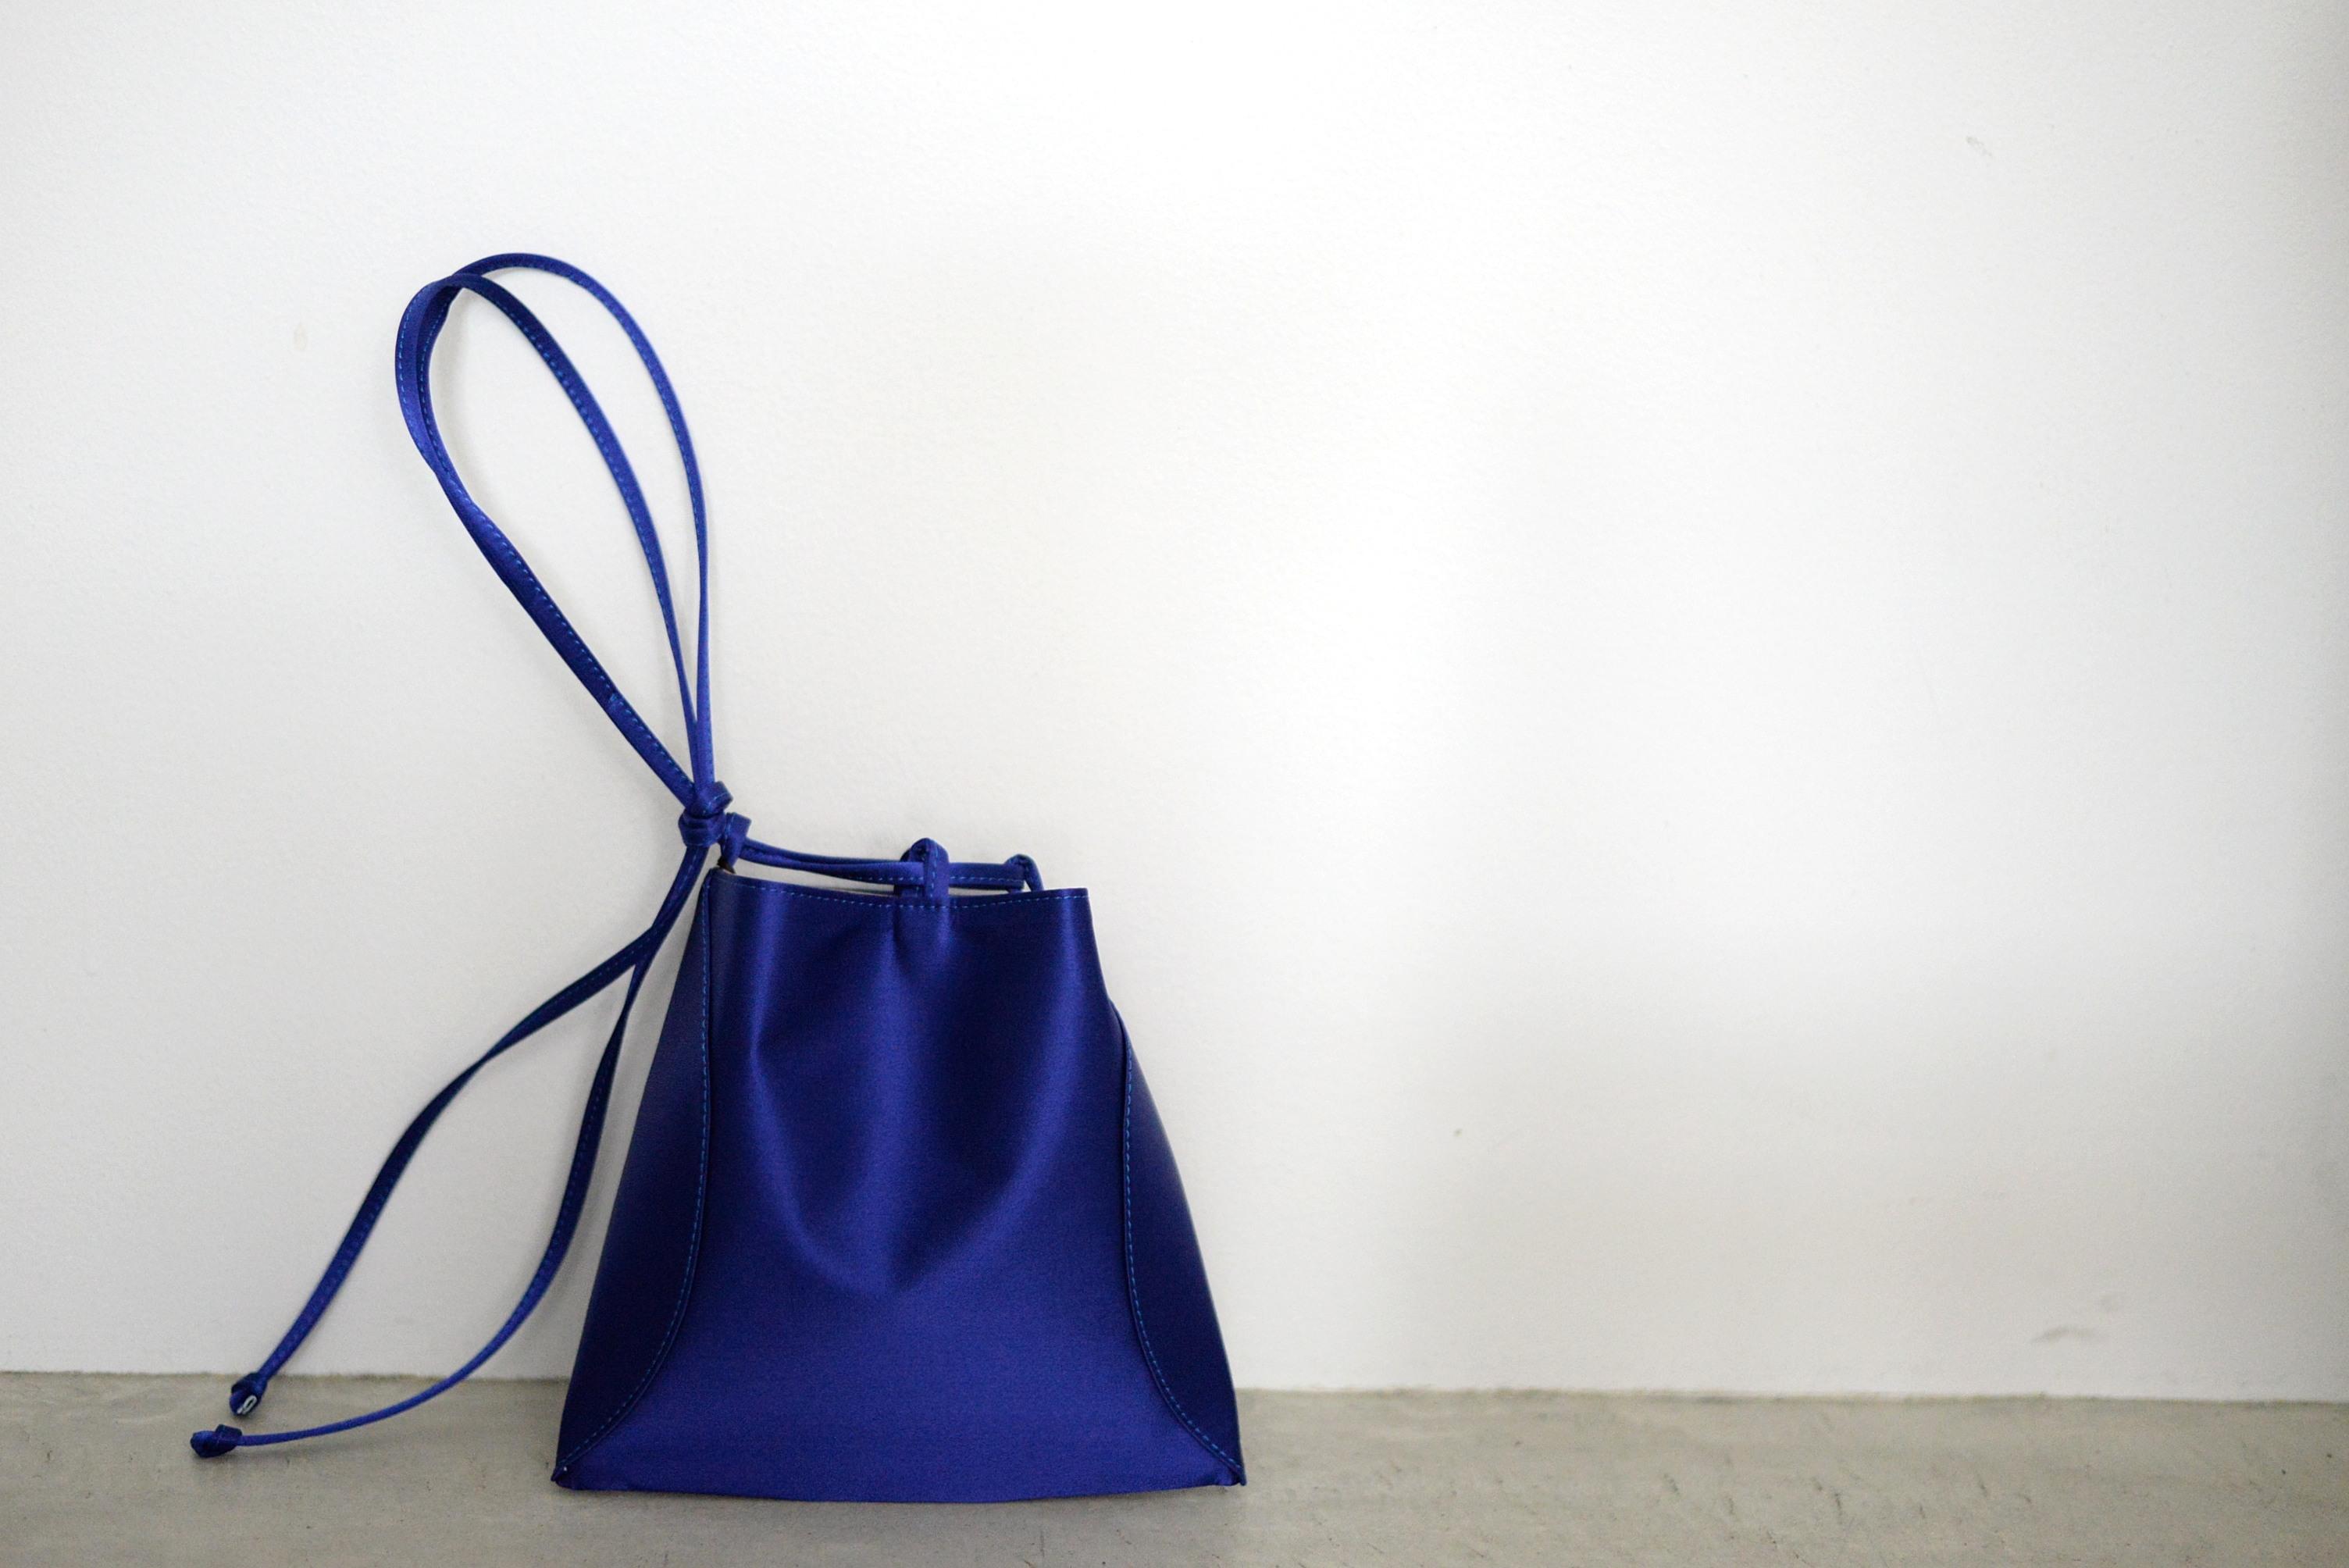 NEW brand!   小ぶりが可愛い【MARROW】BAG!!